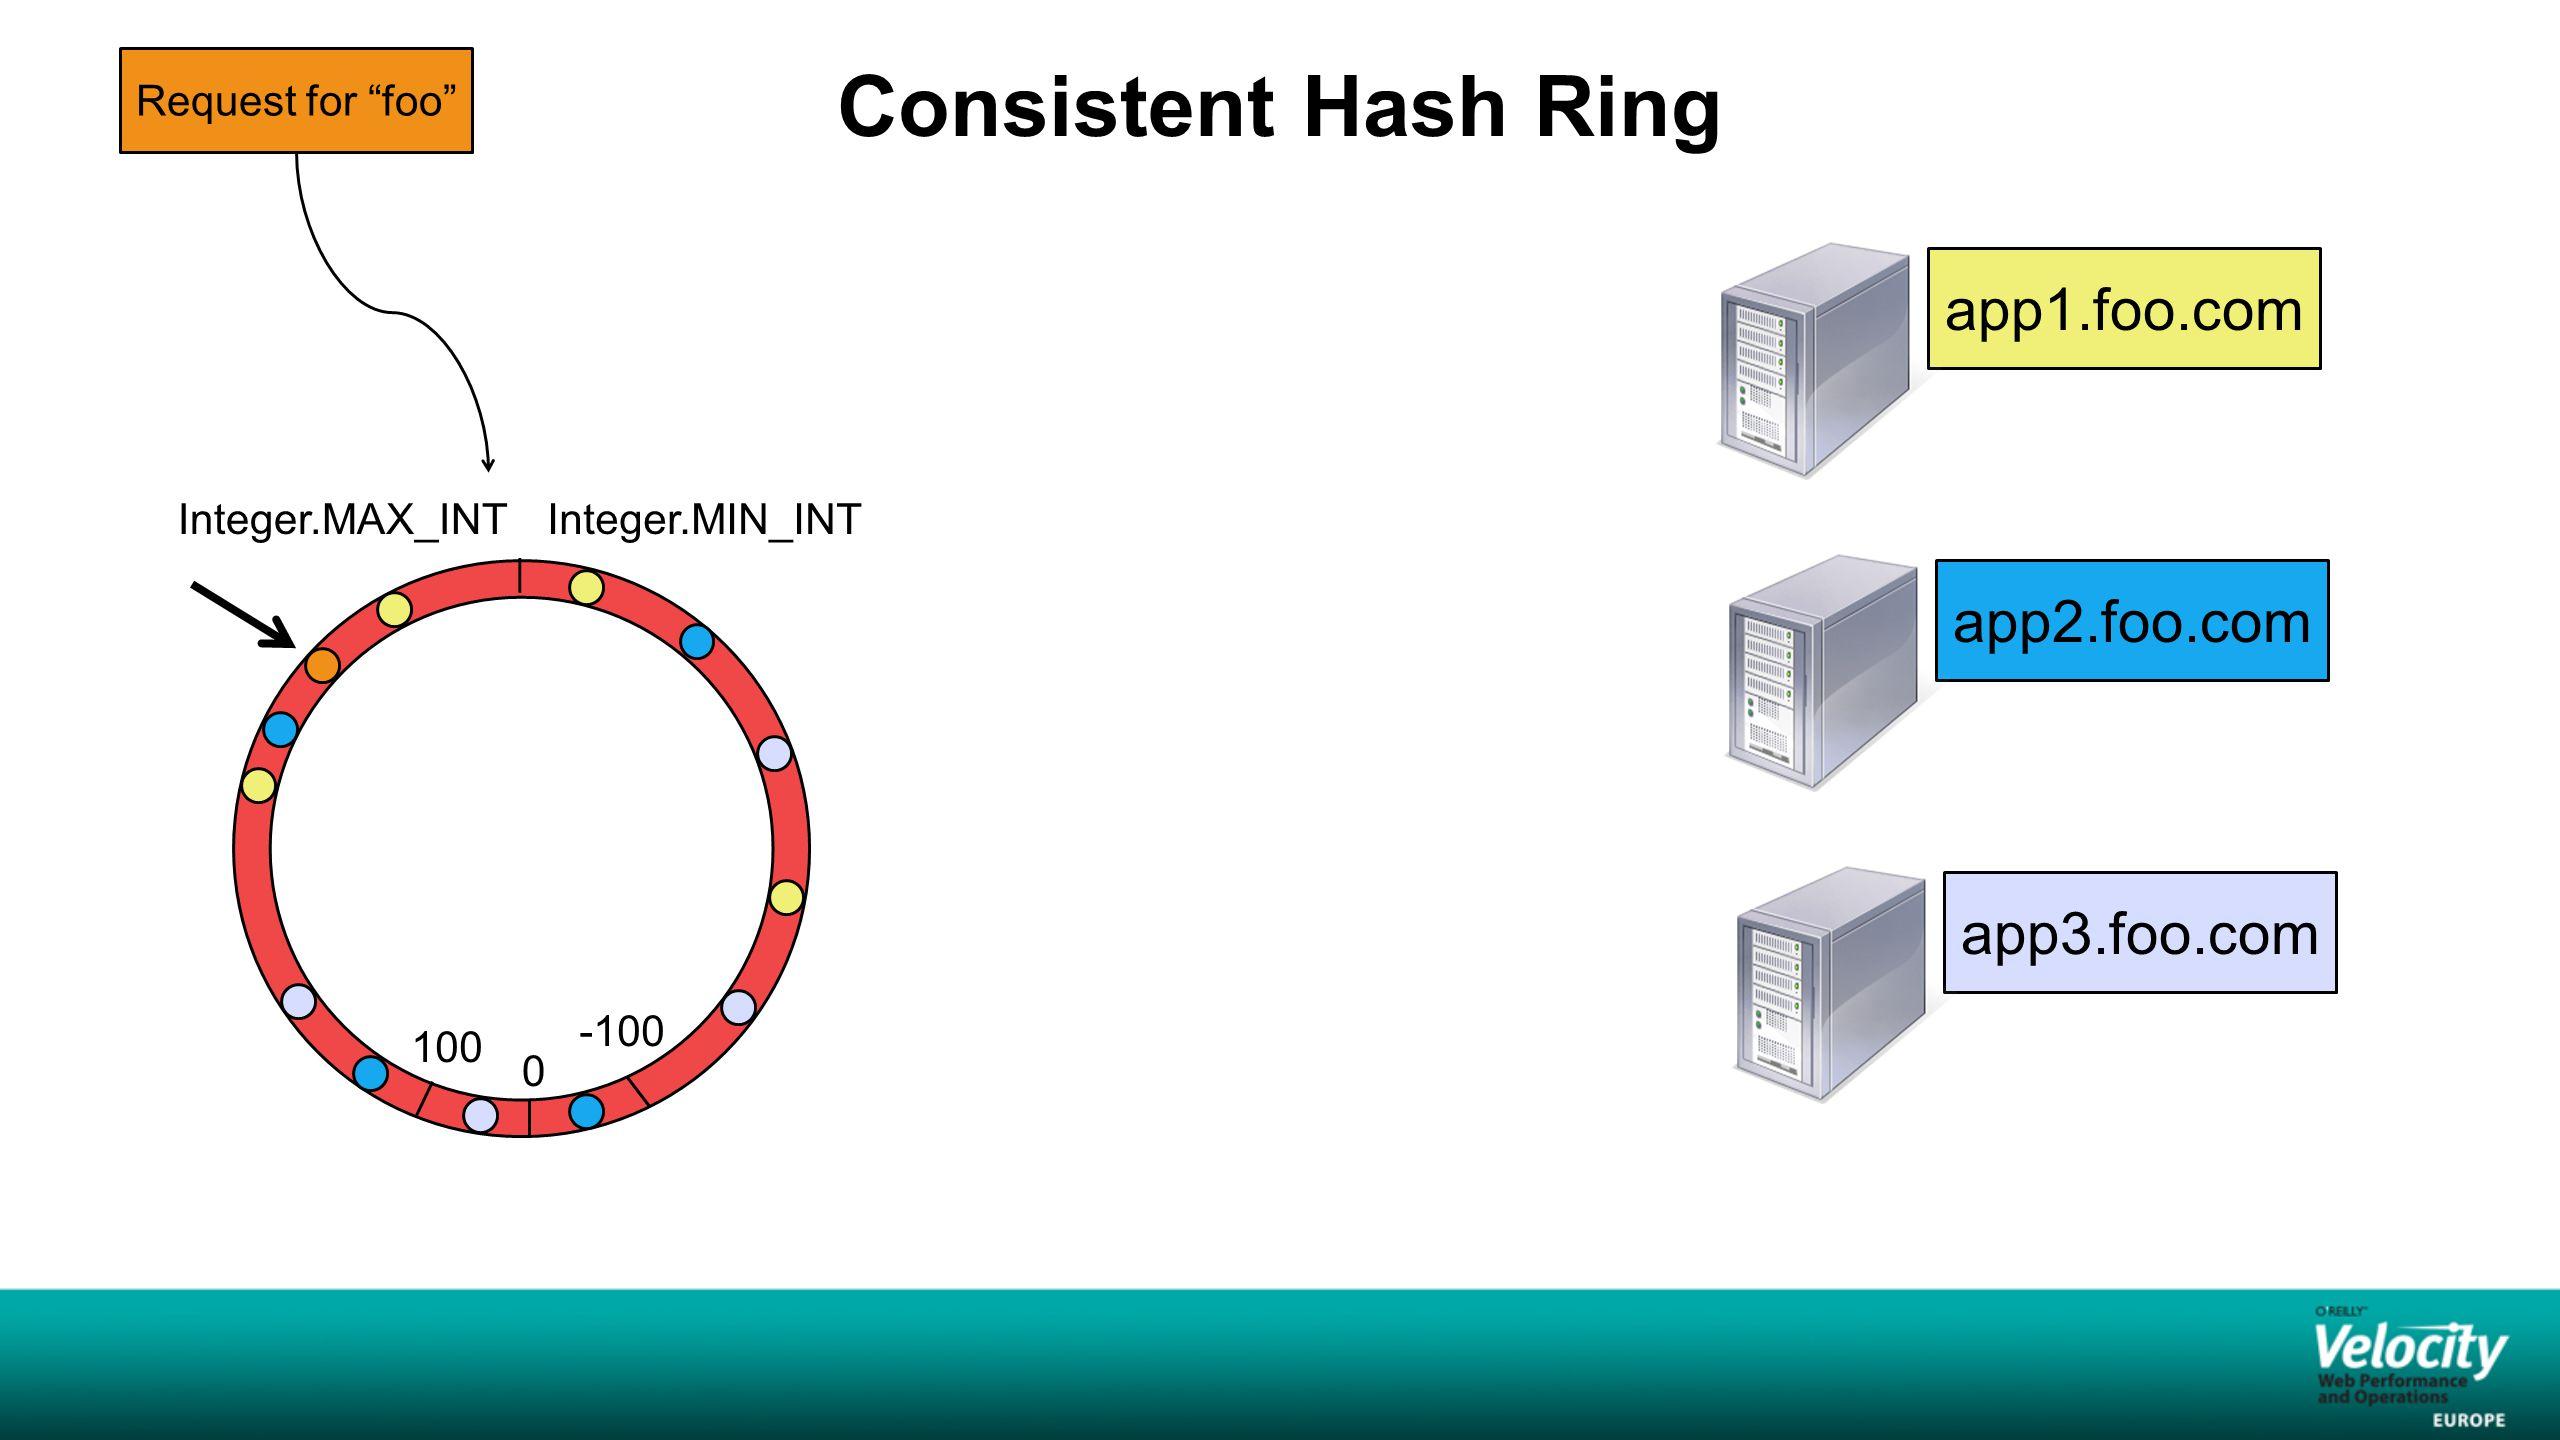 "Consistent Hash Ring | Integer.MAX_INTInteger.MIN_INT 0 100 -100 app1.foo.com app2.foo.com app3.foo.com Request for ""foo"""